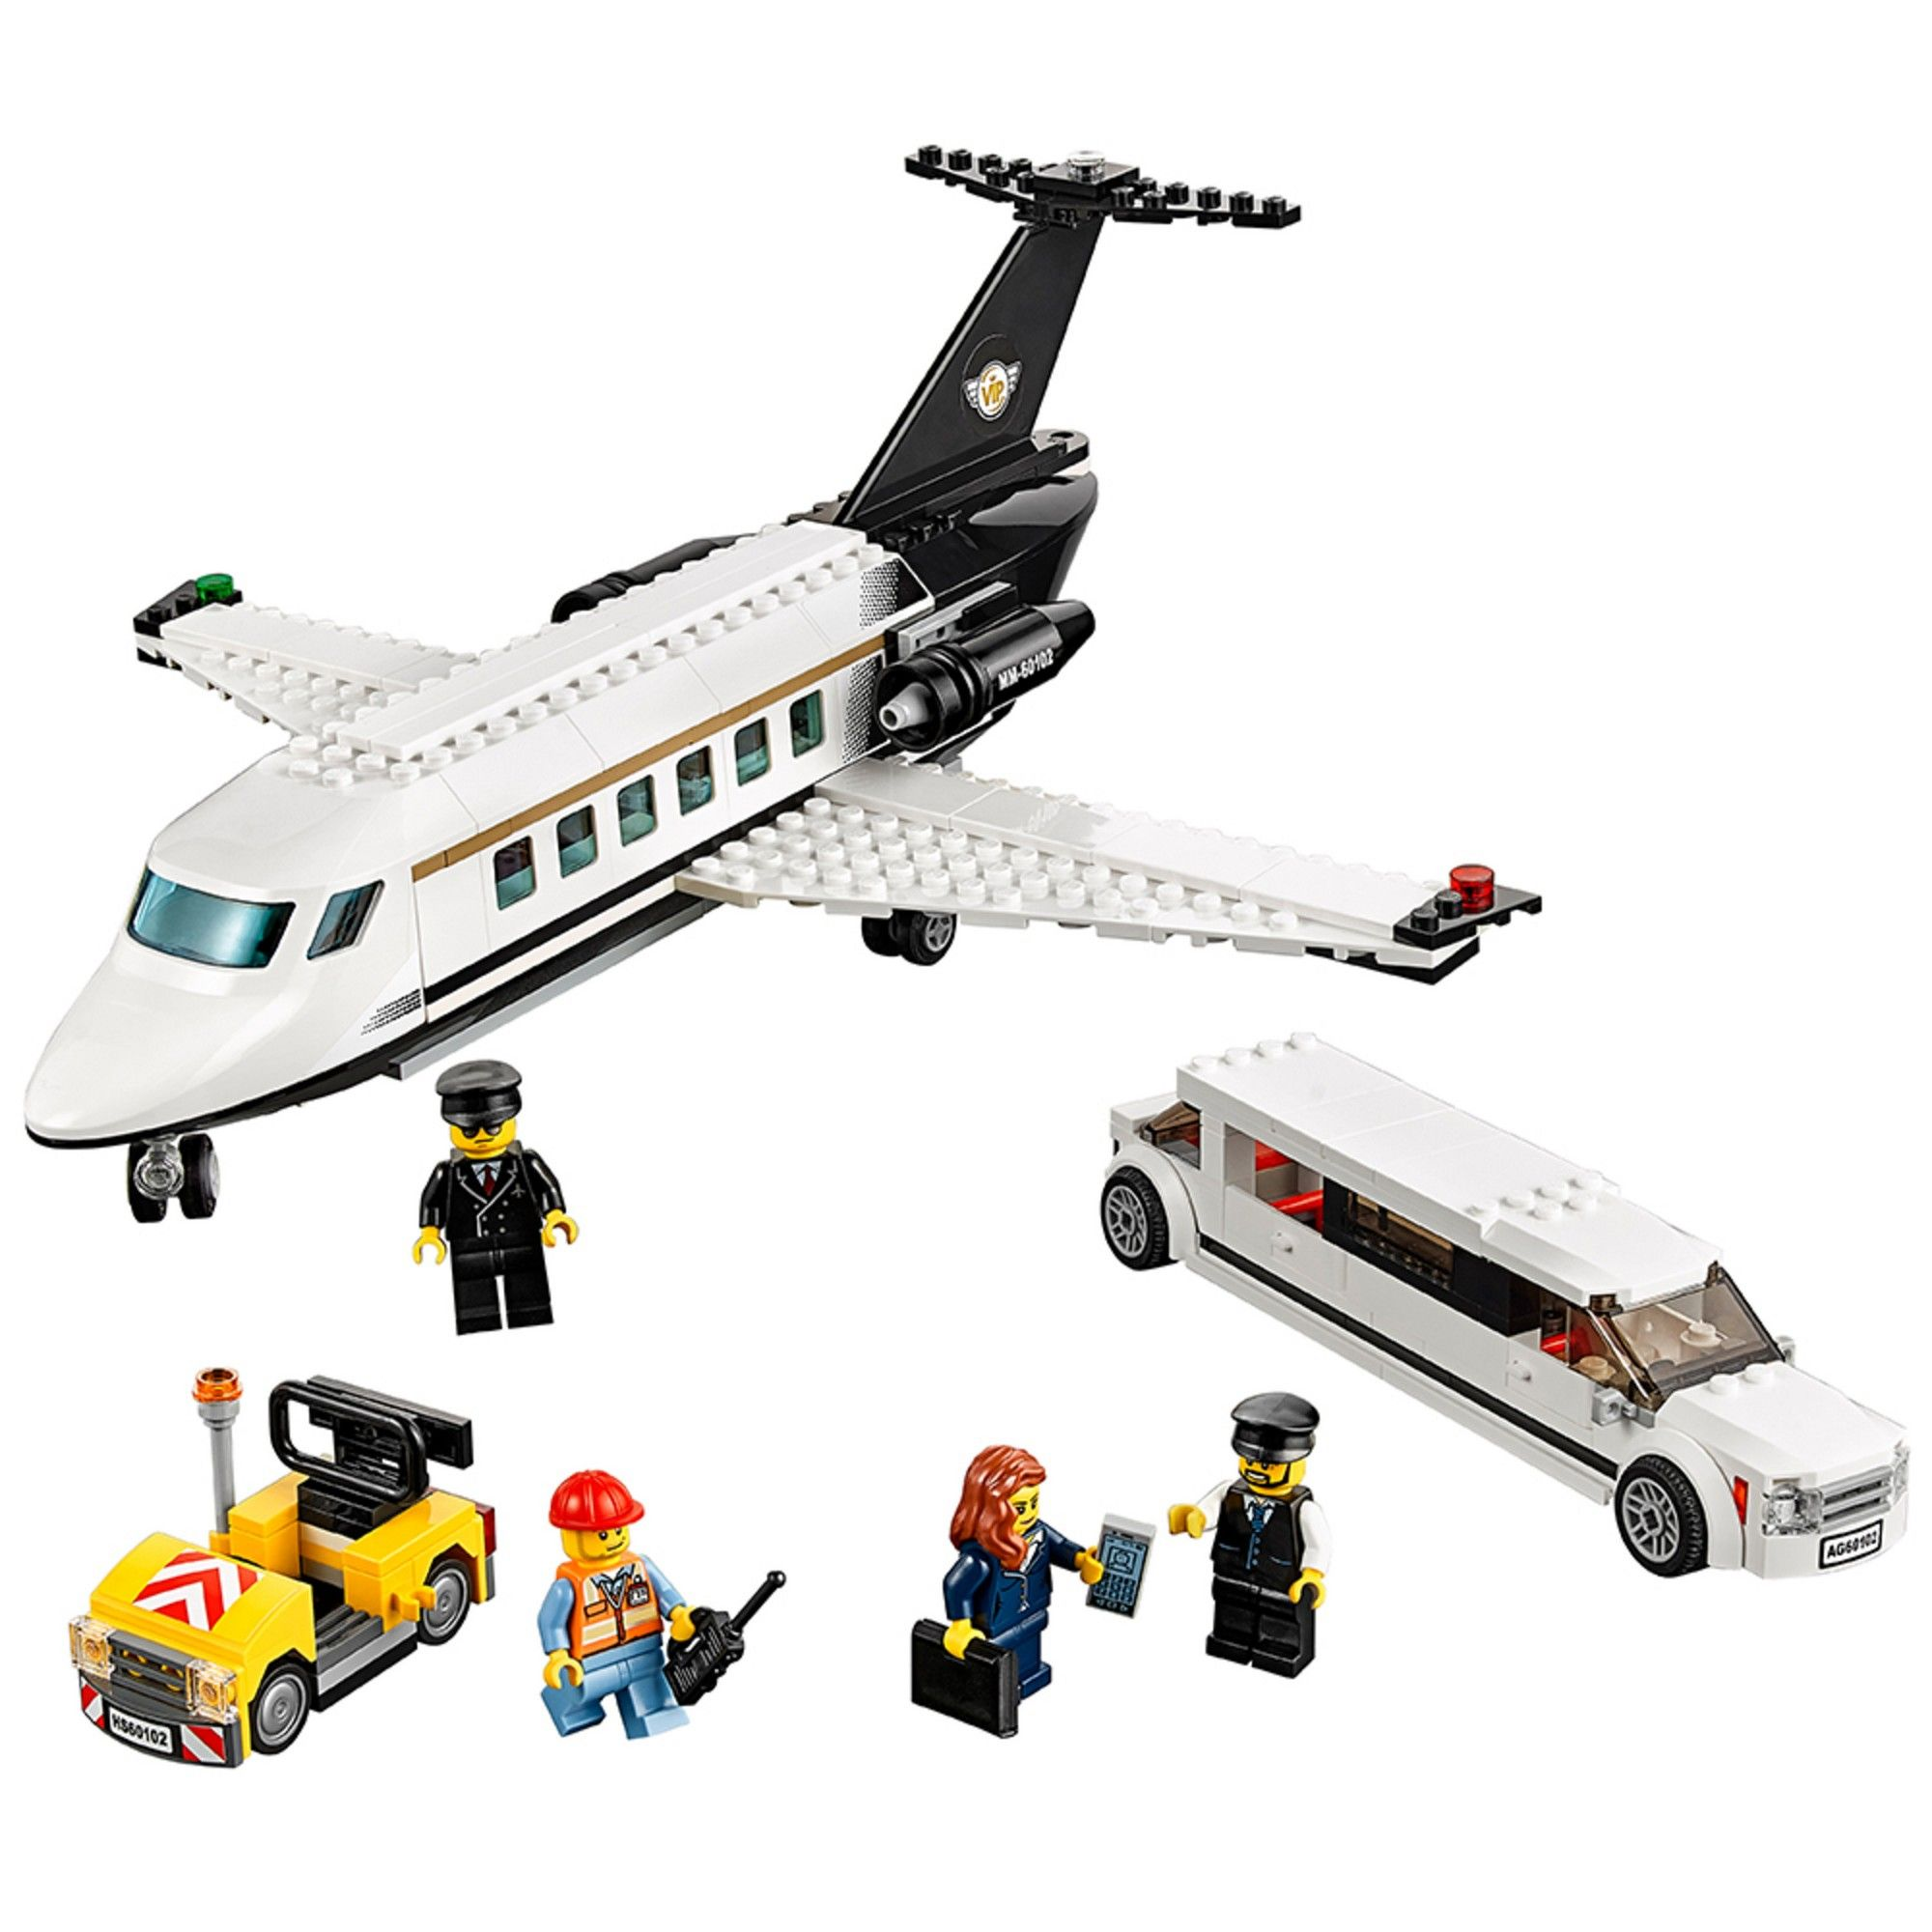 LEGO City Airport VIP Service 60102 airplane